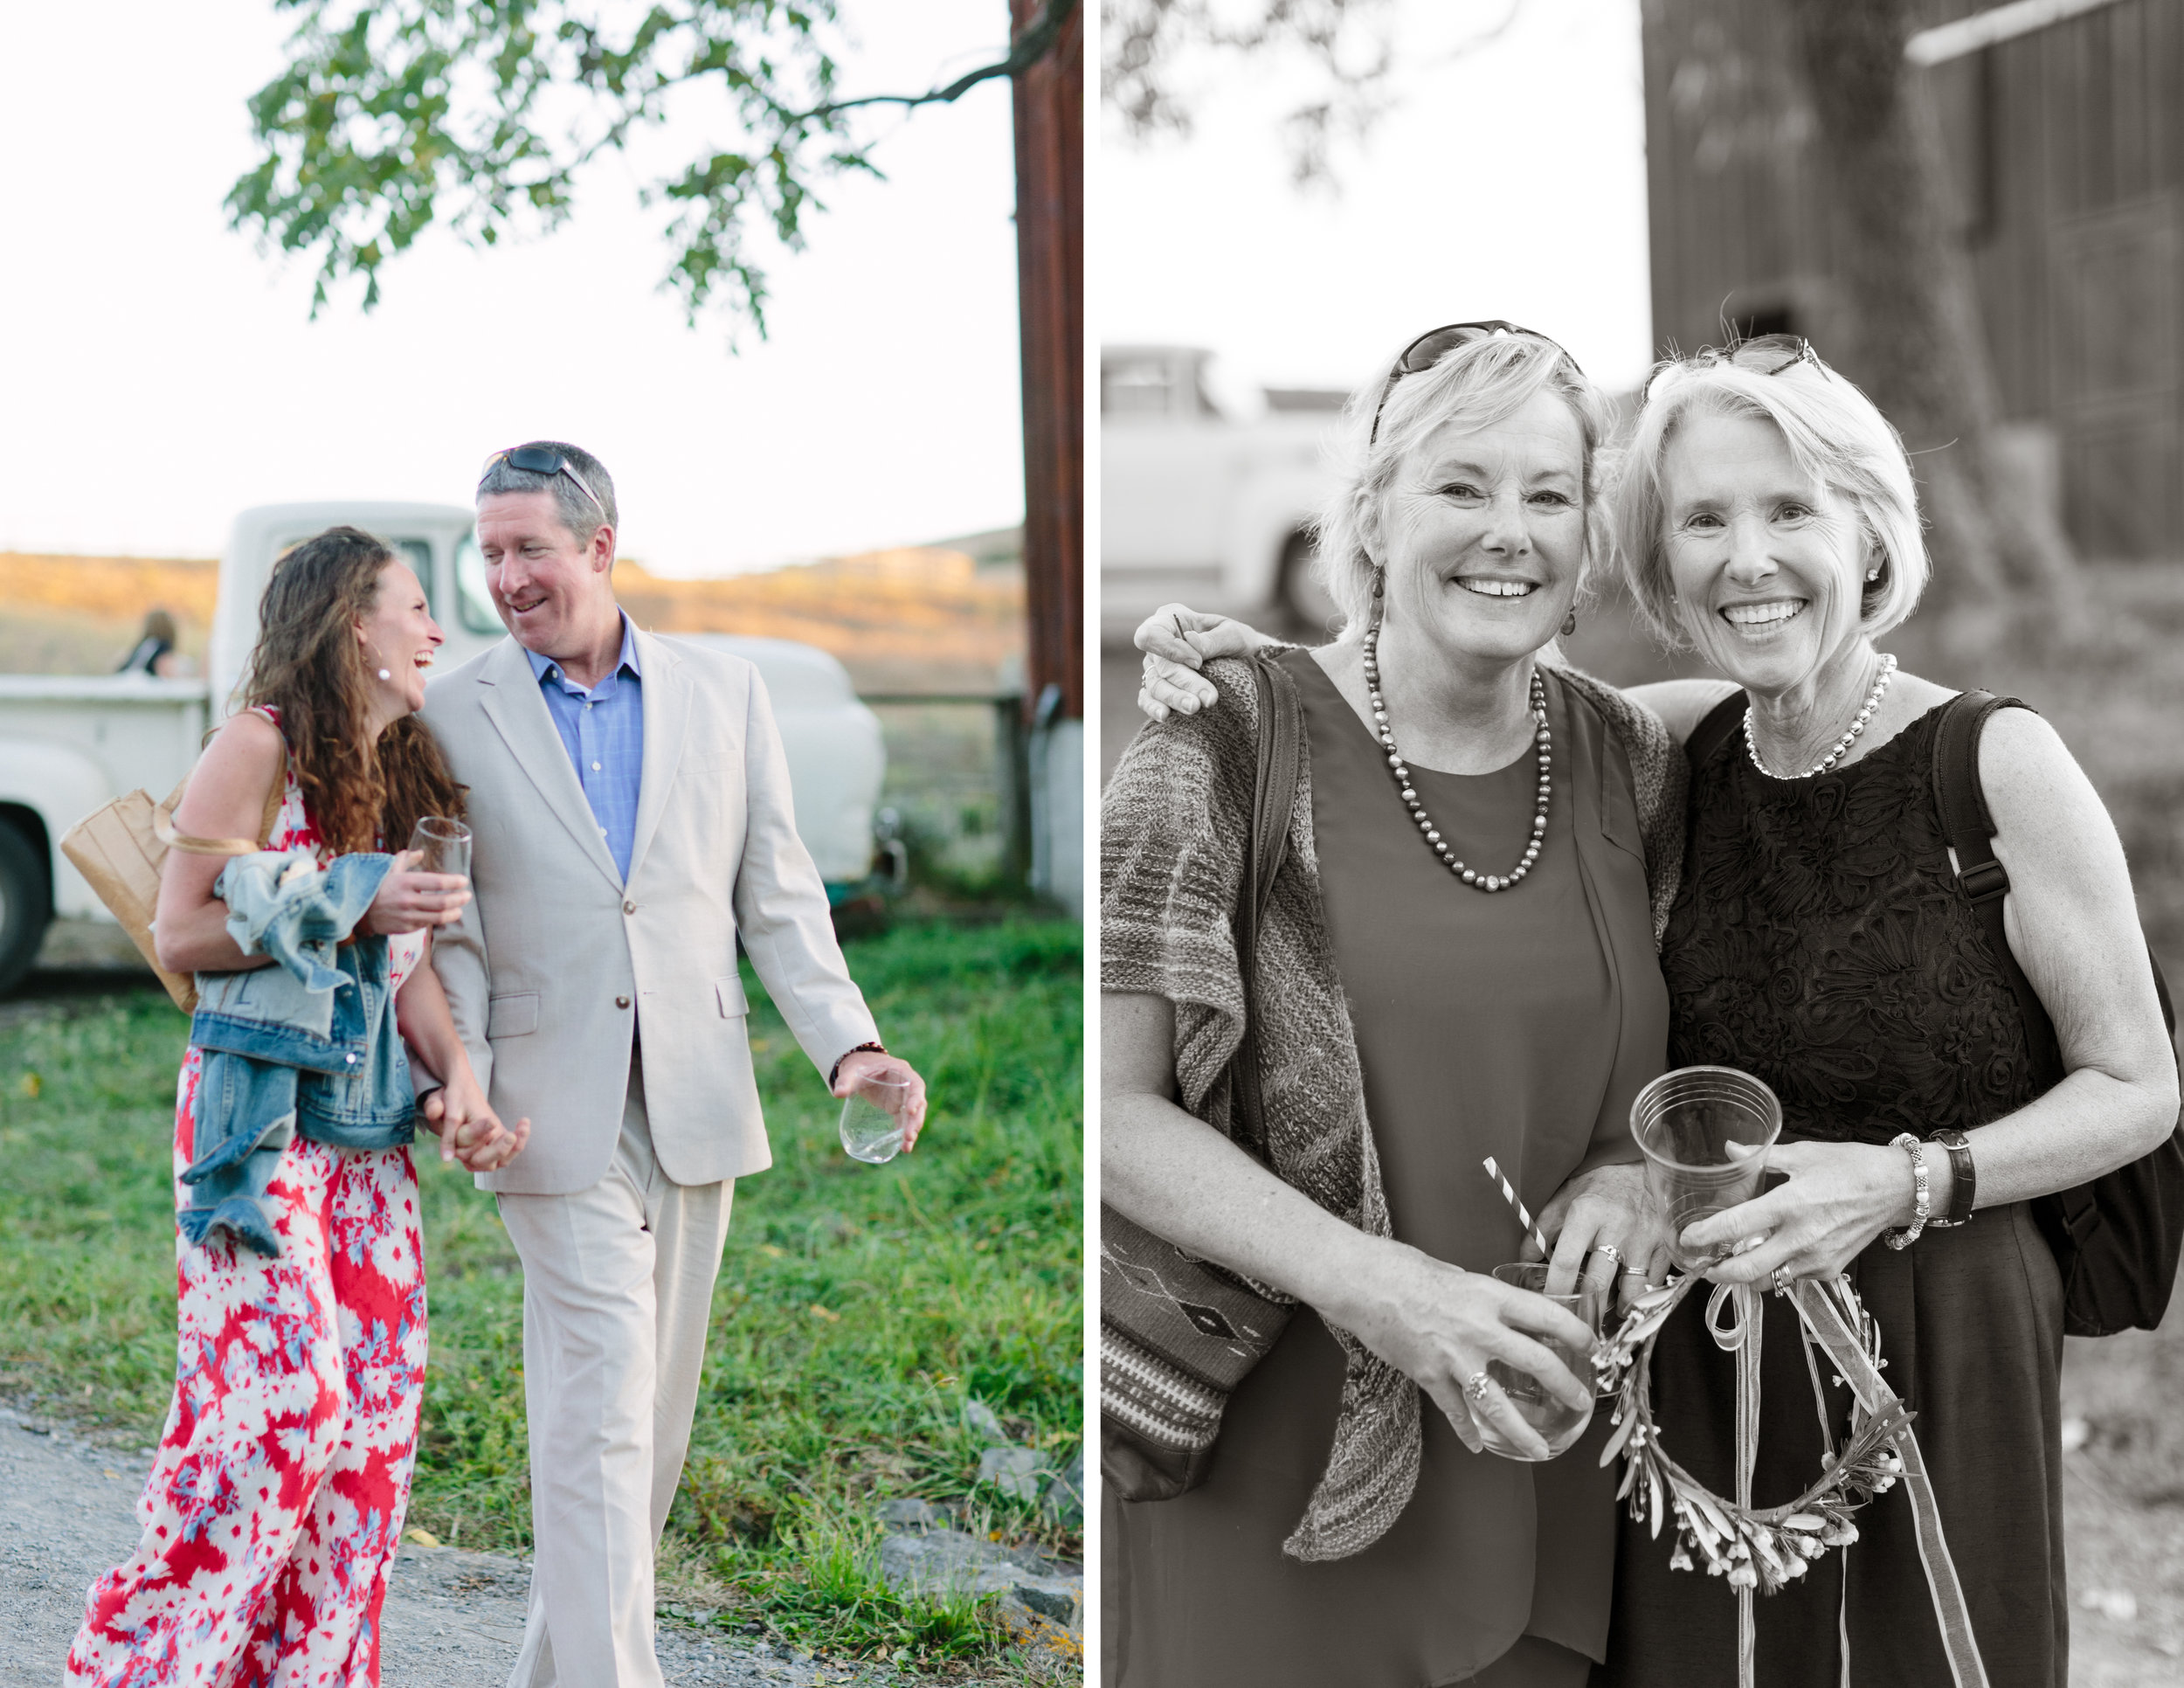 bloomfield farms wedding 7.jpg